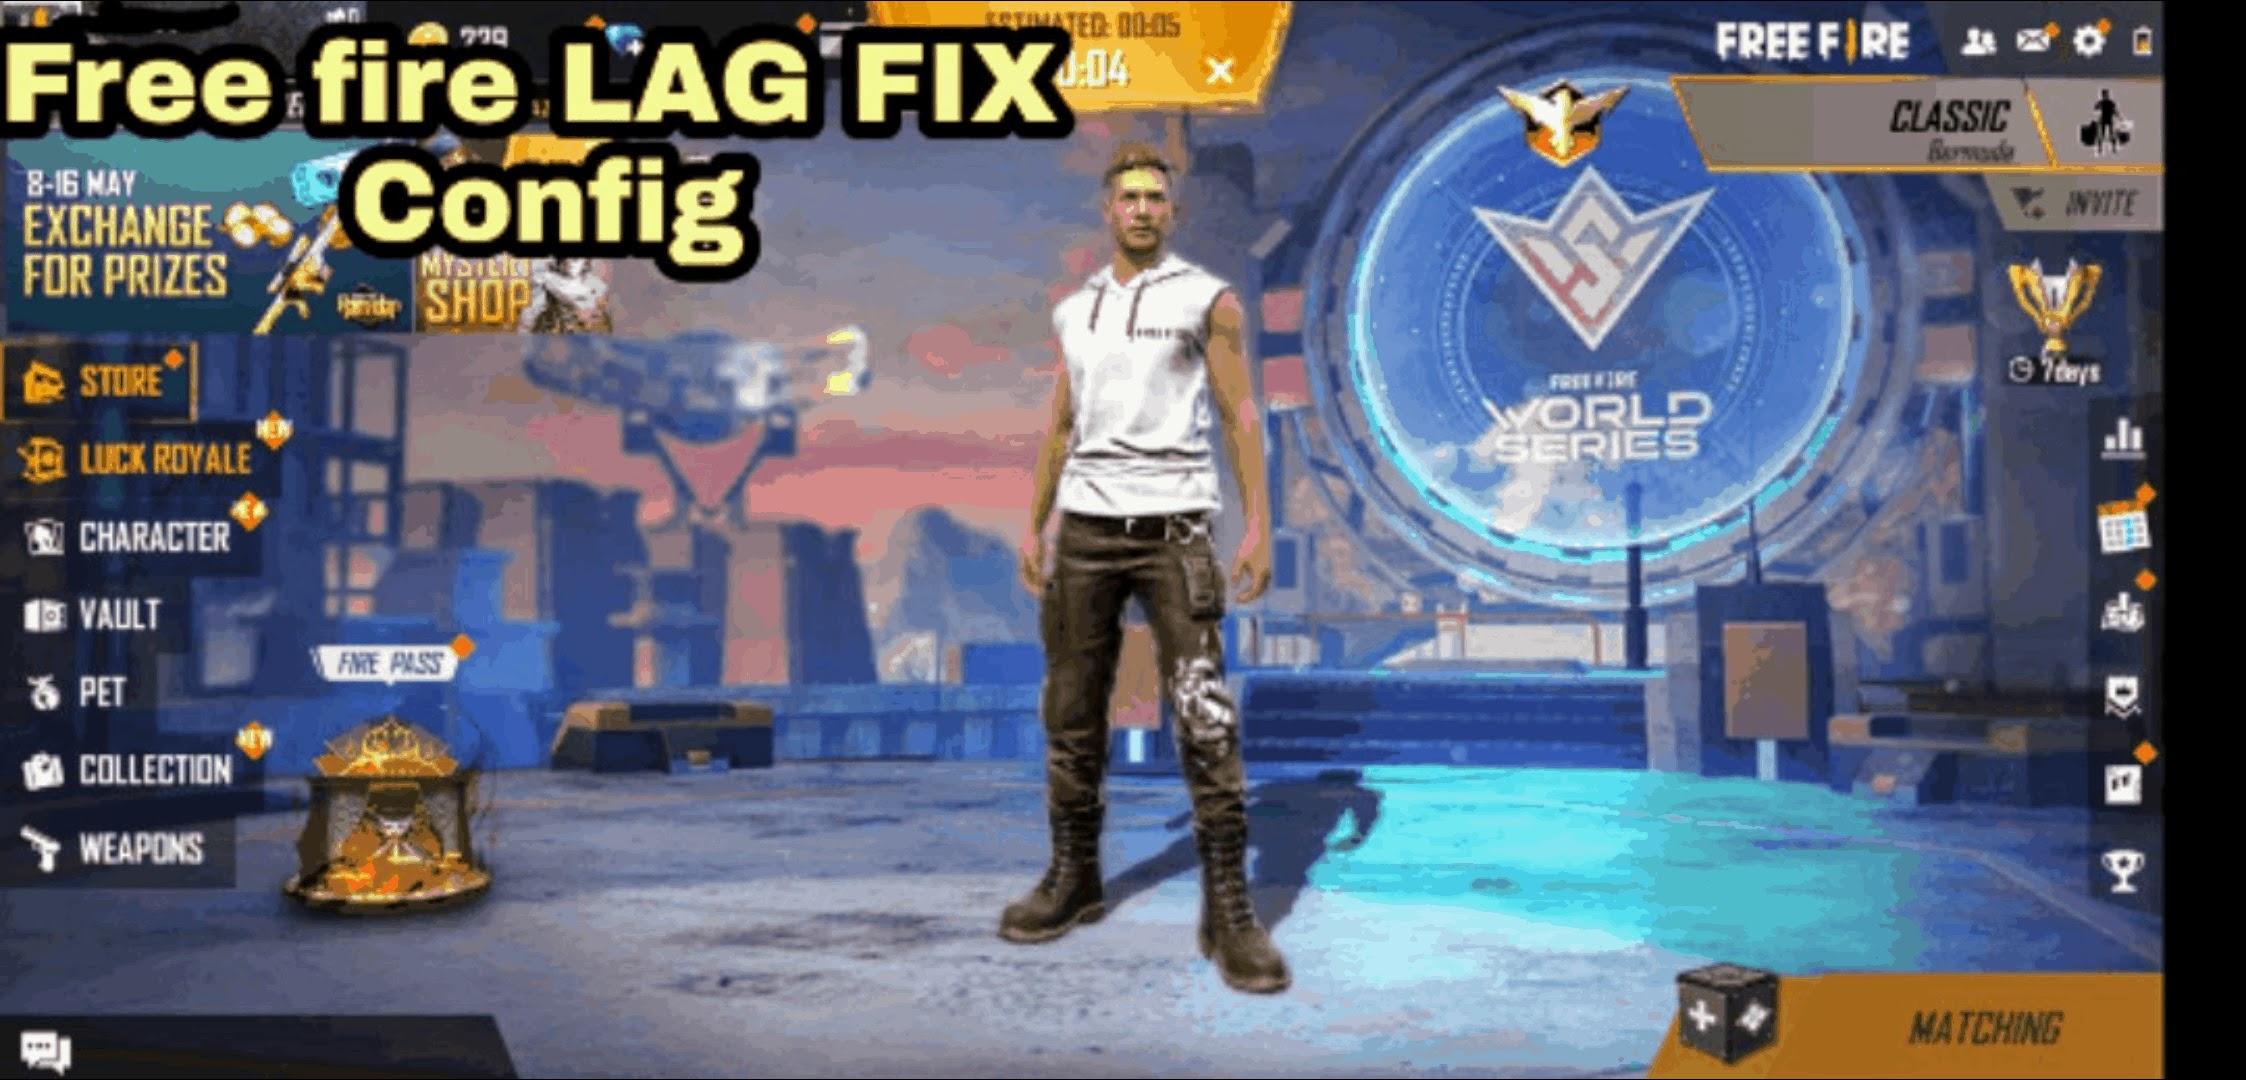 Free fire config file 1.60.6 | LAG FIX | 60 FPS | 1GB/2GB/3GB/4GB RAM